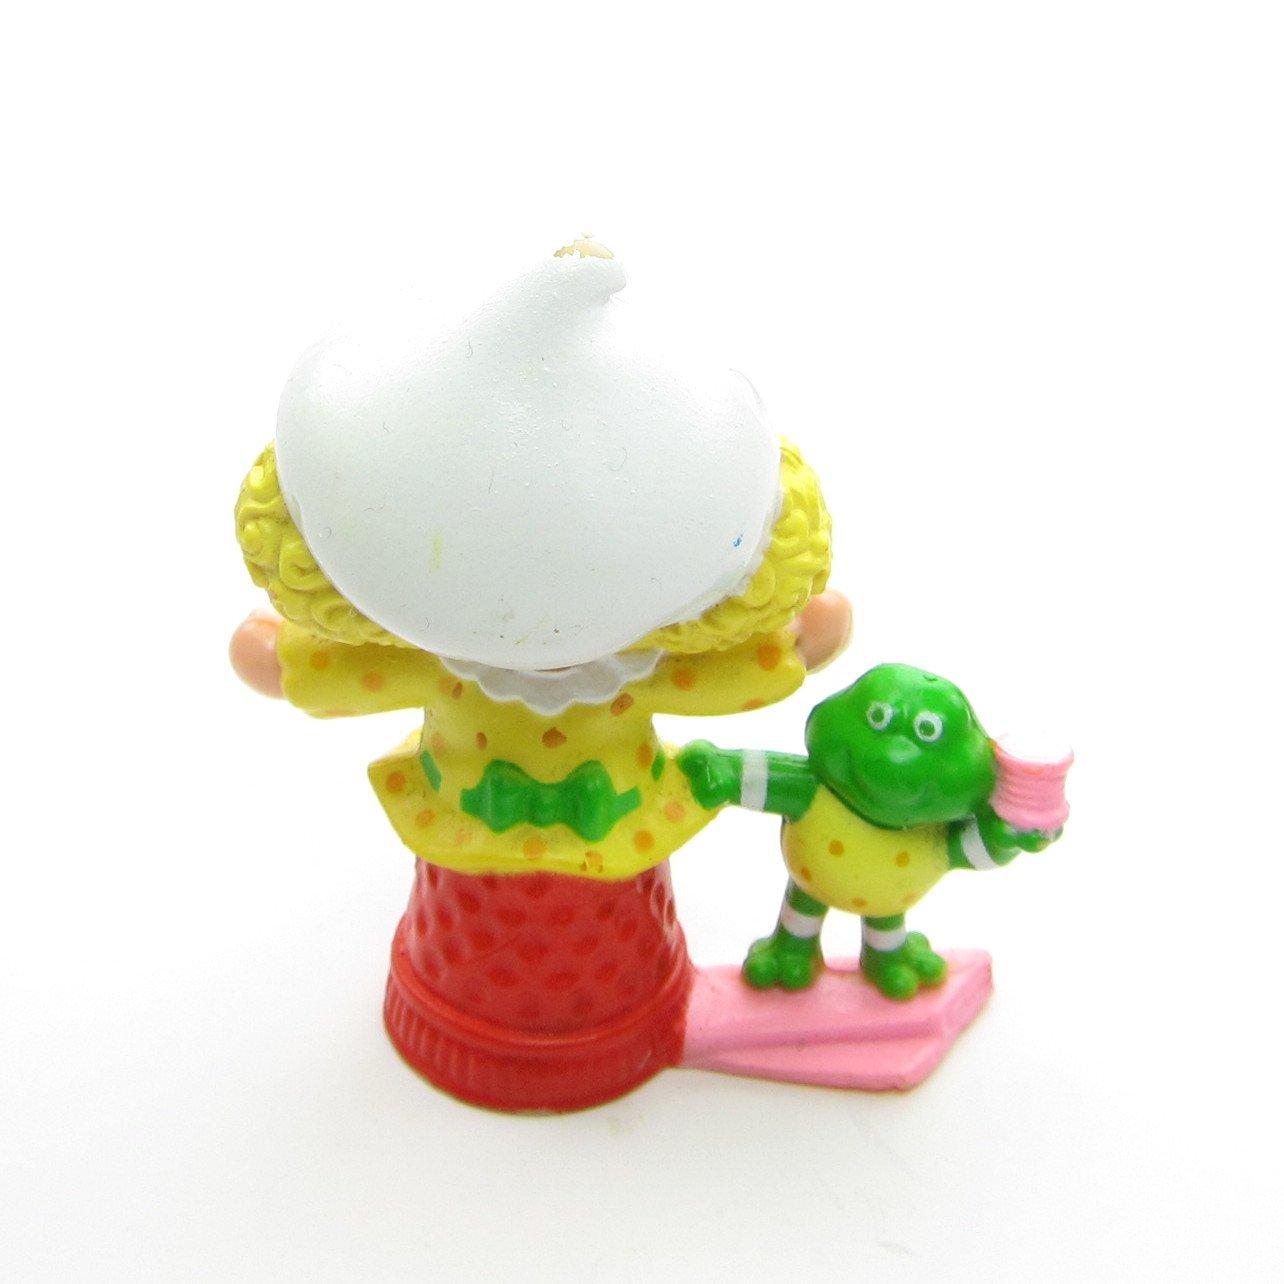 Vintage 1980s Strawberry Shortcake mini figurine - Lemon